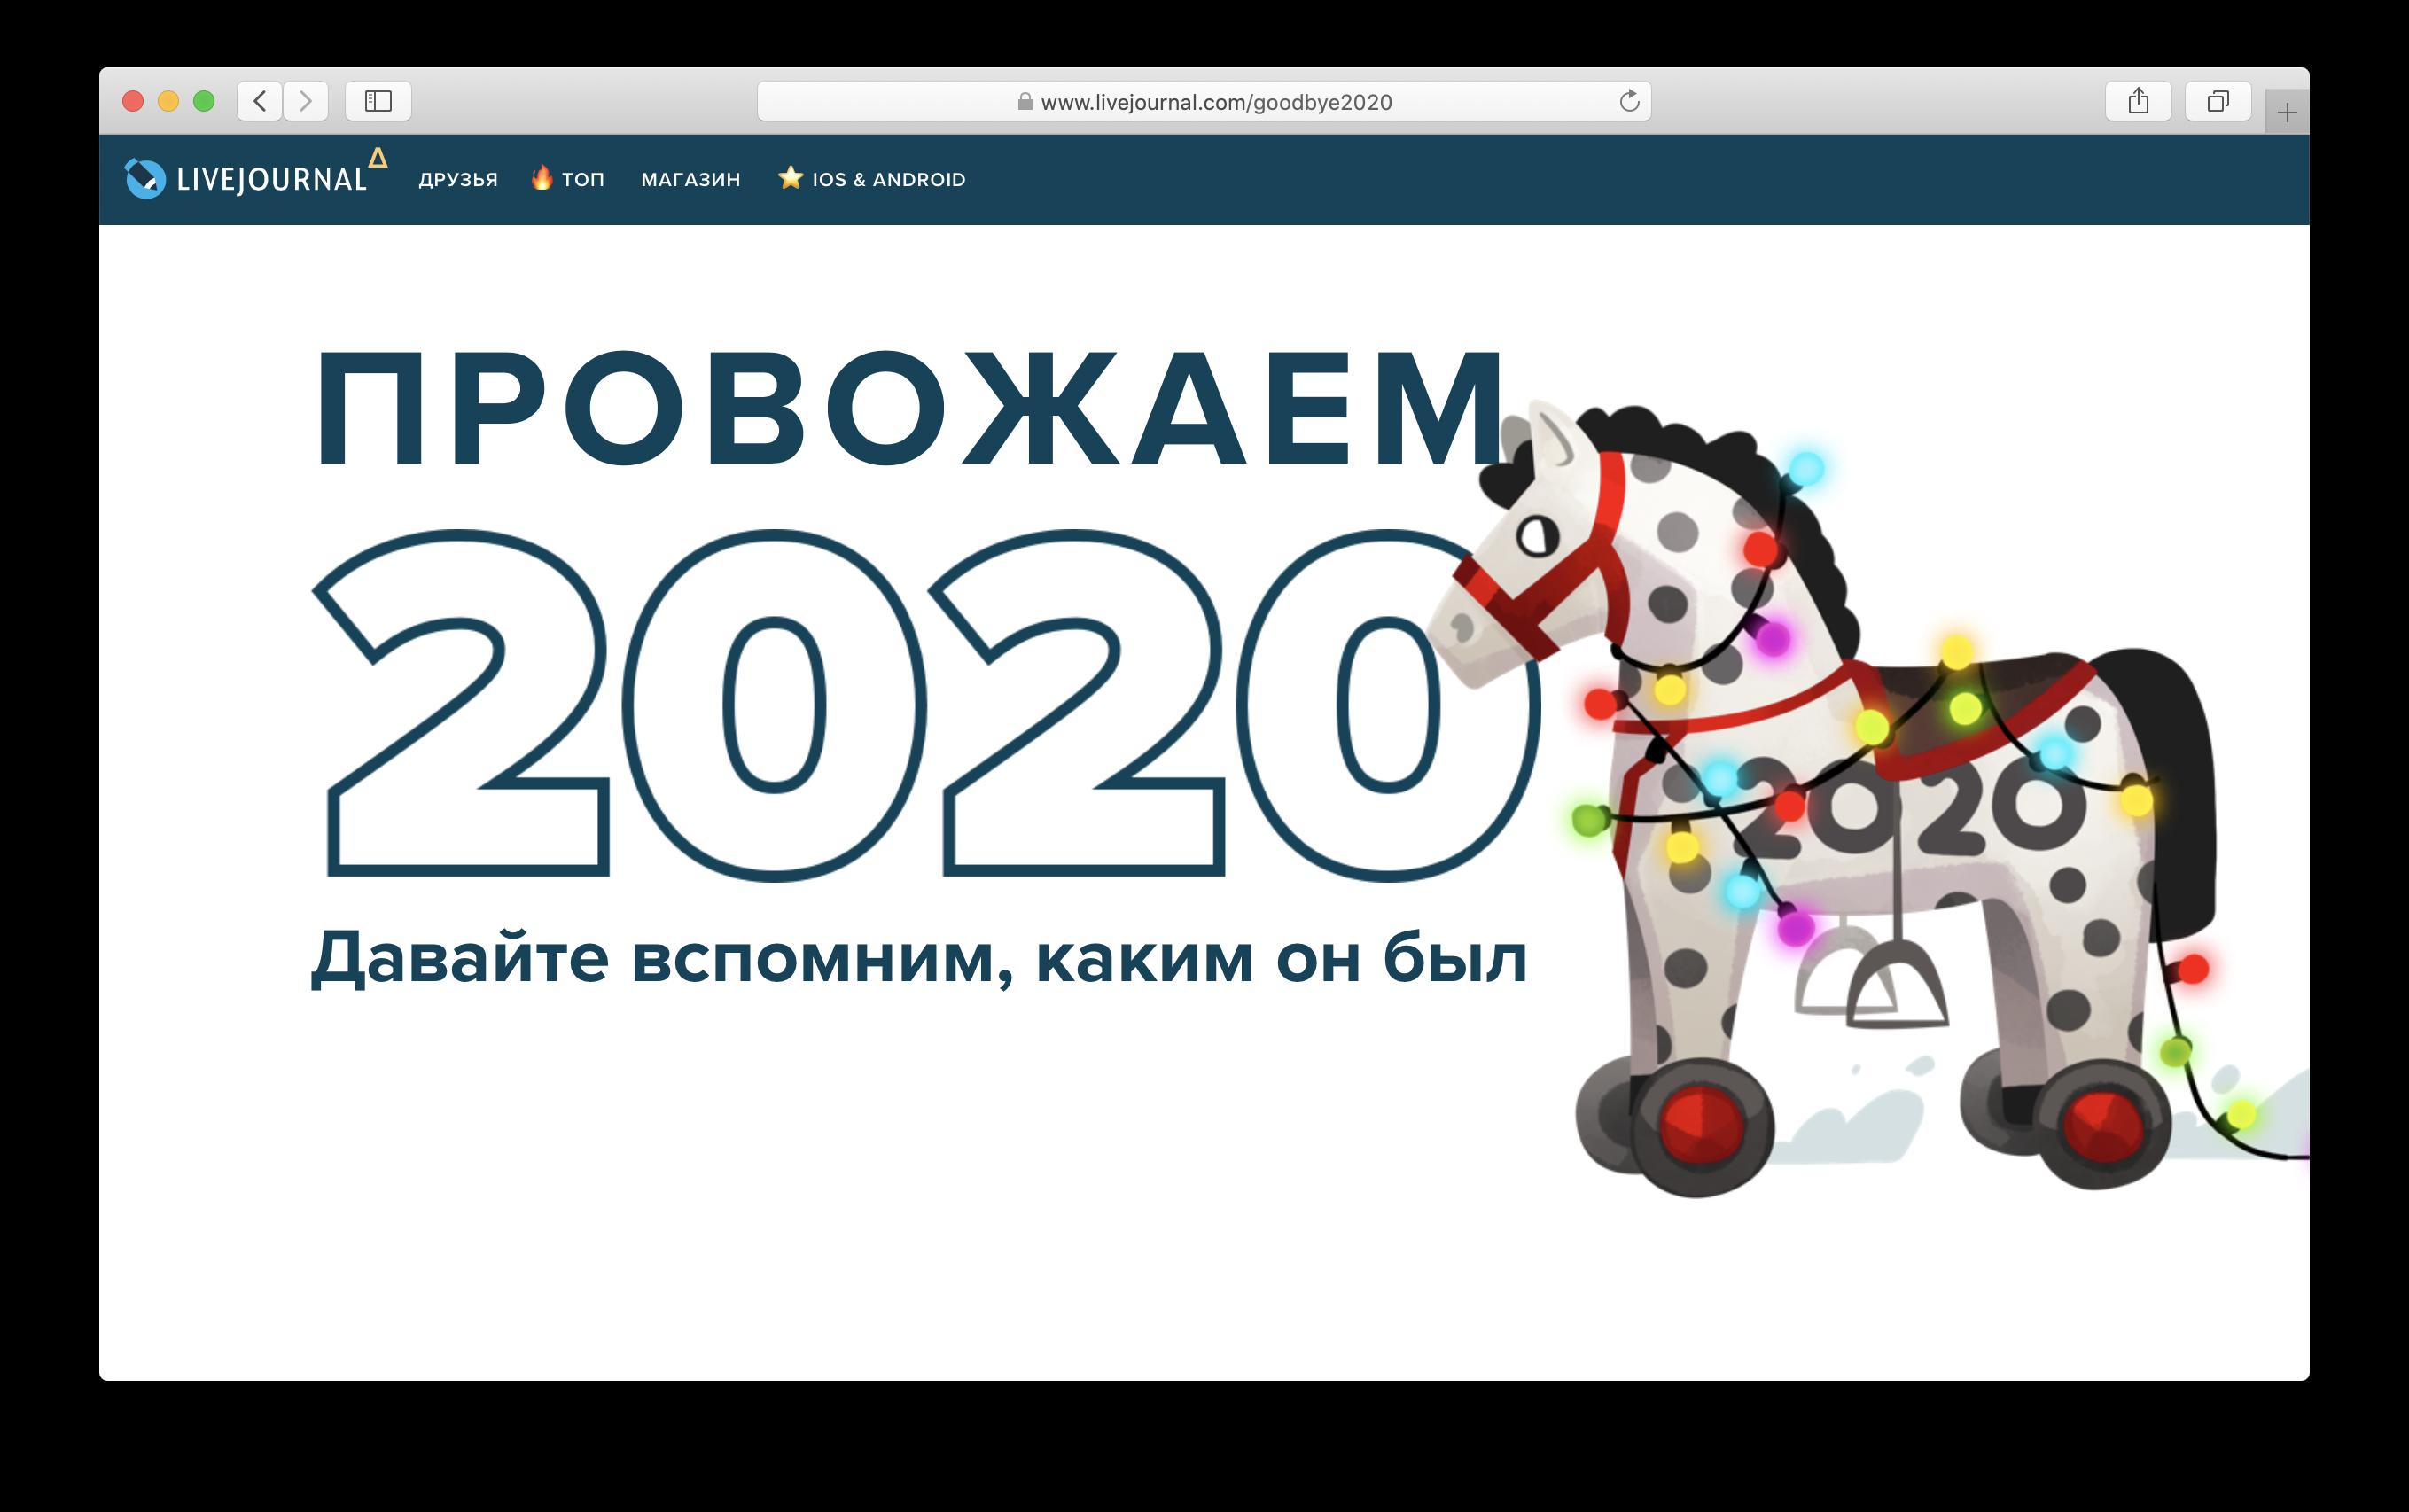 Проект редакции Живого Журнала «Провожаем 2020»